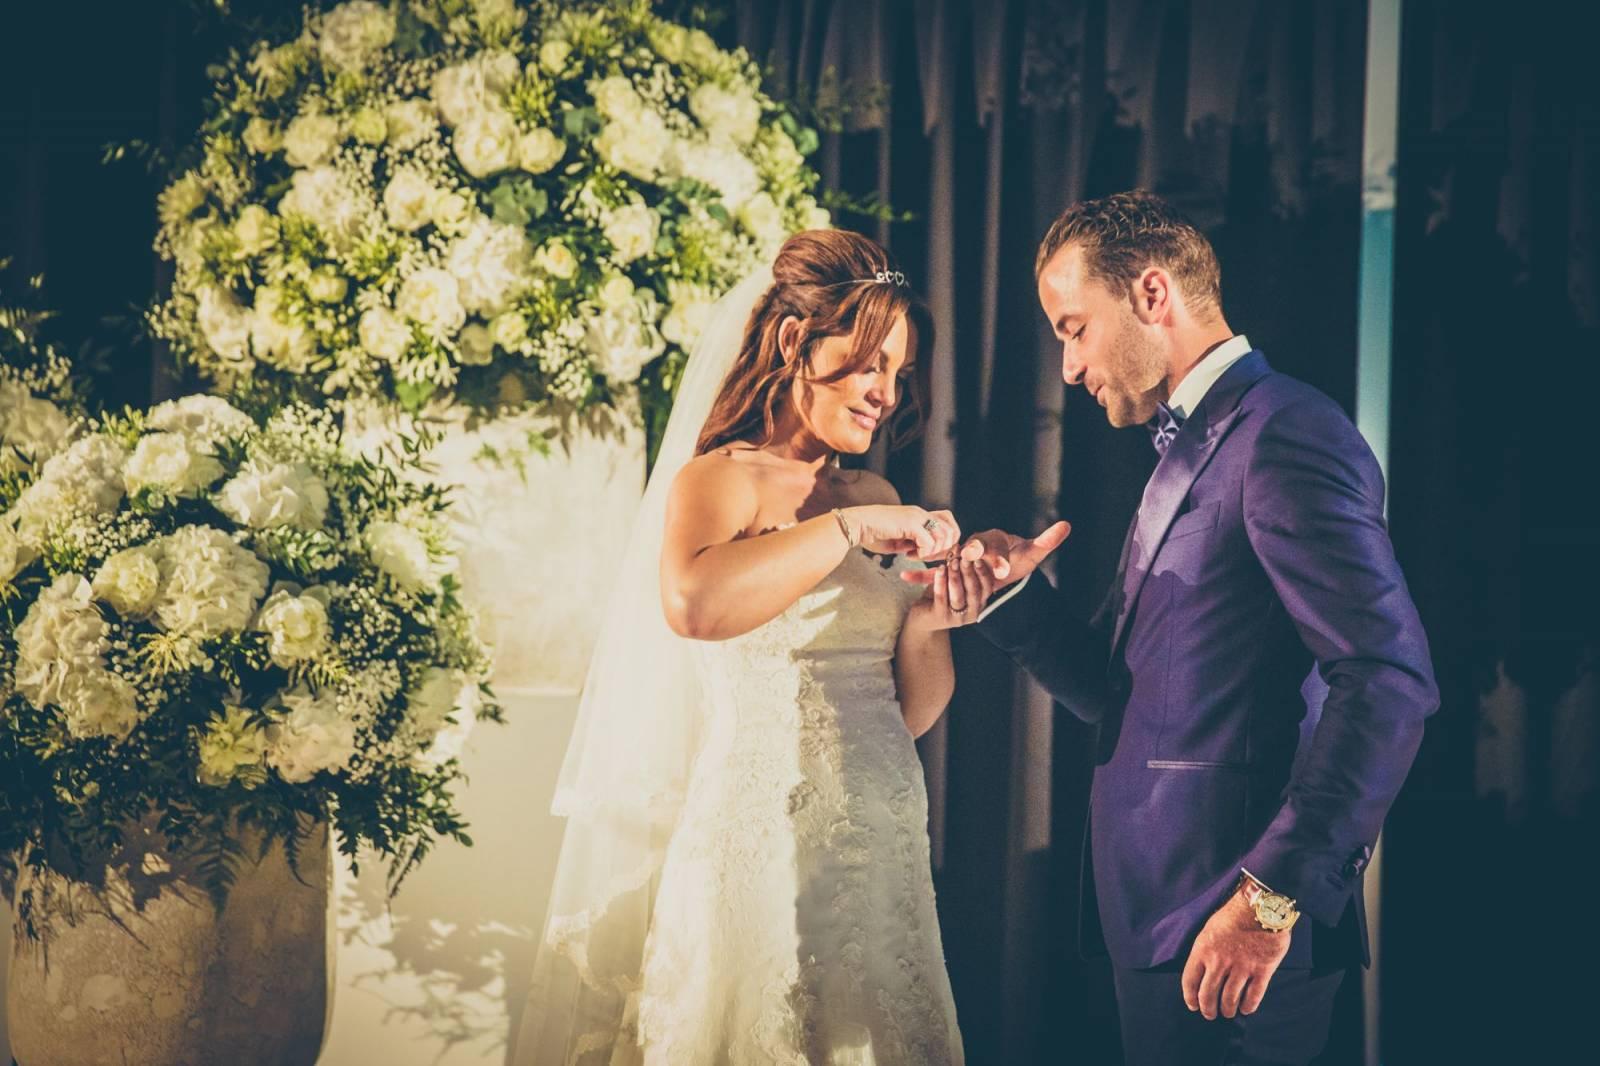 Carpe Diem Bloemen & Decoratie - House of Weddings  - 14